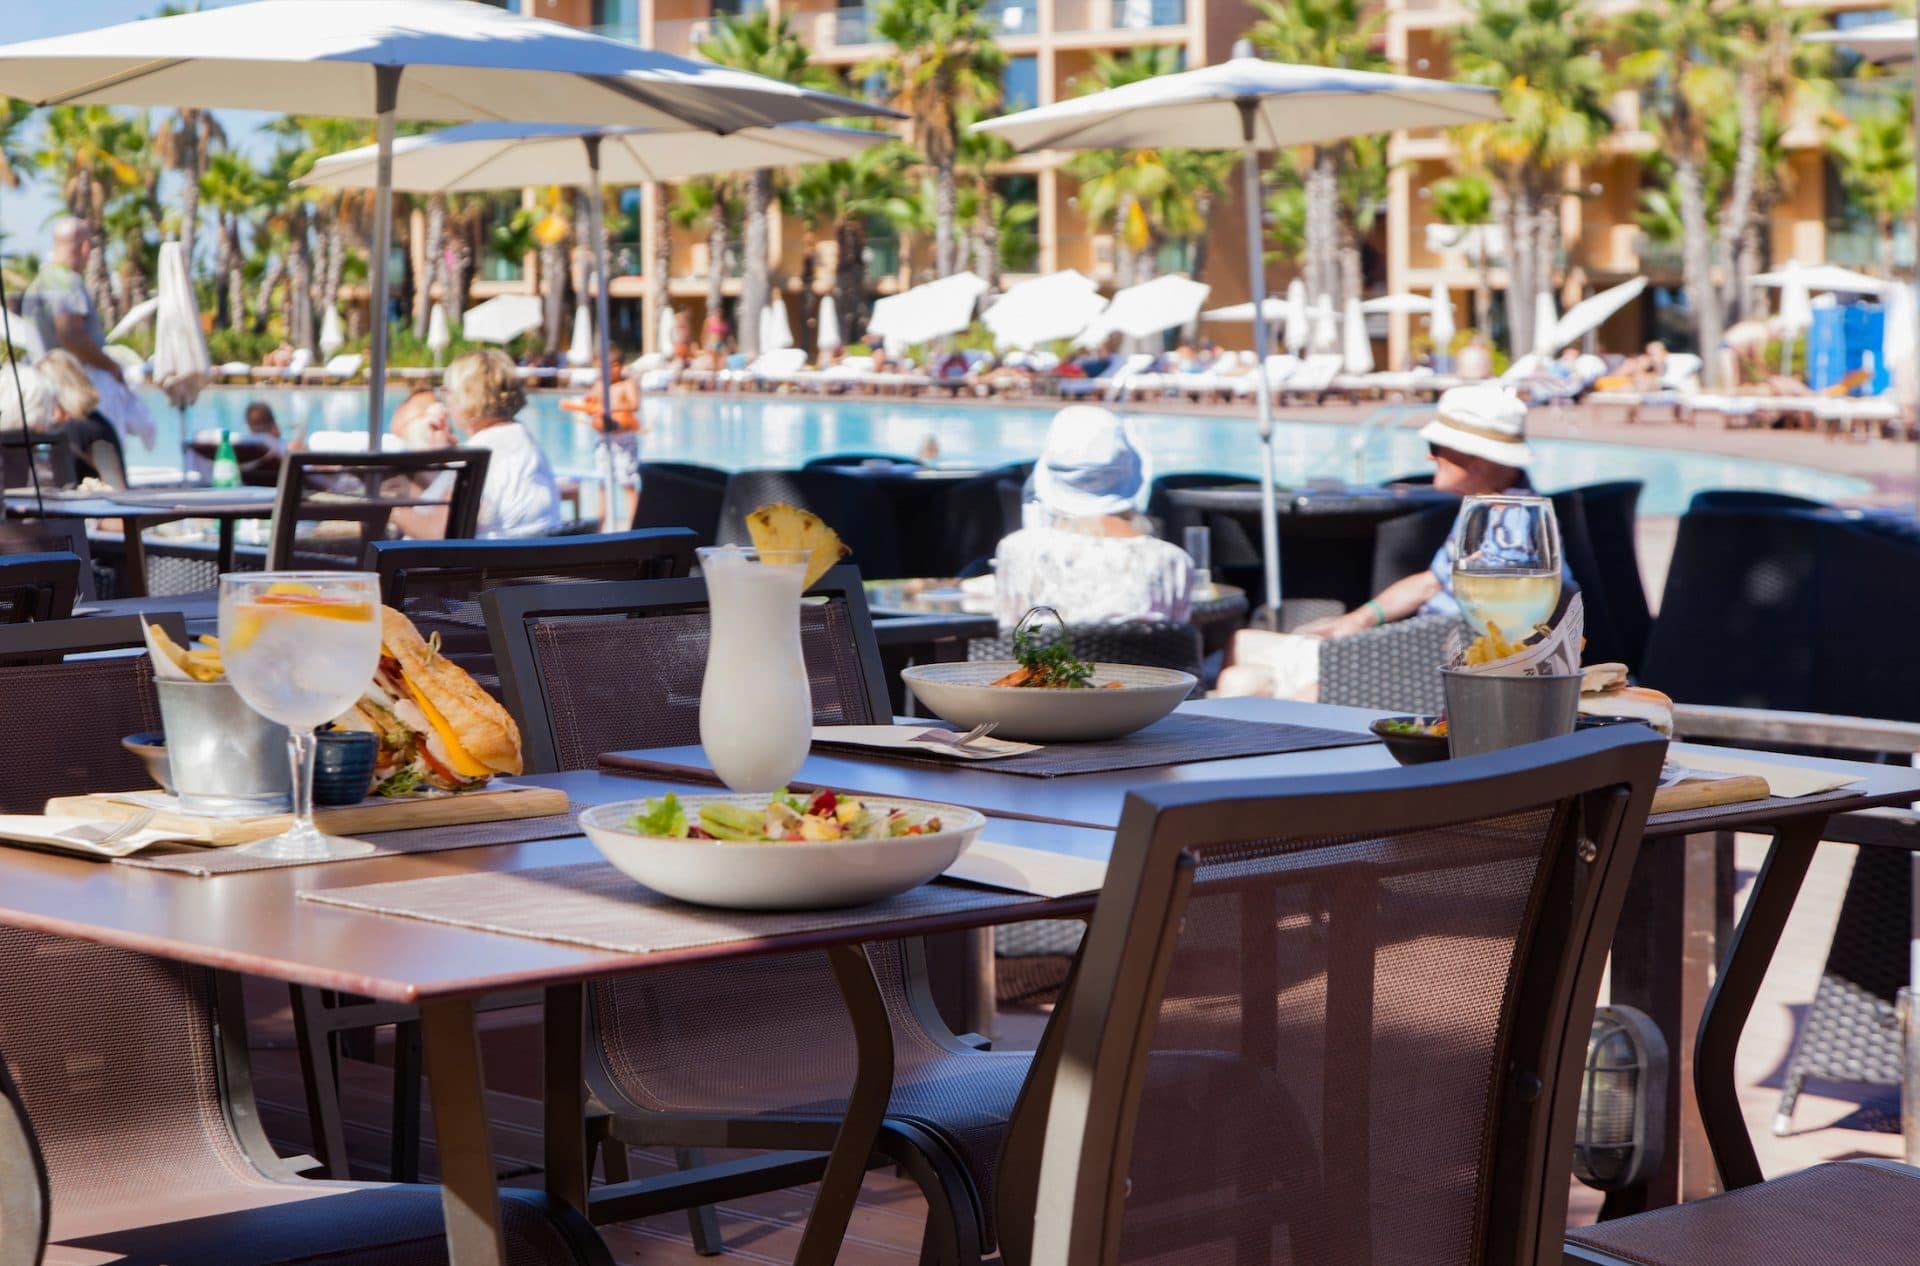 sunset-restaurant-bar-VidaMar-hotels-resorts-algarve-1